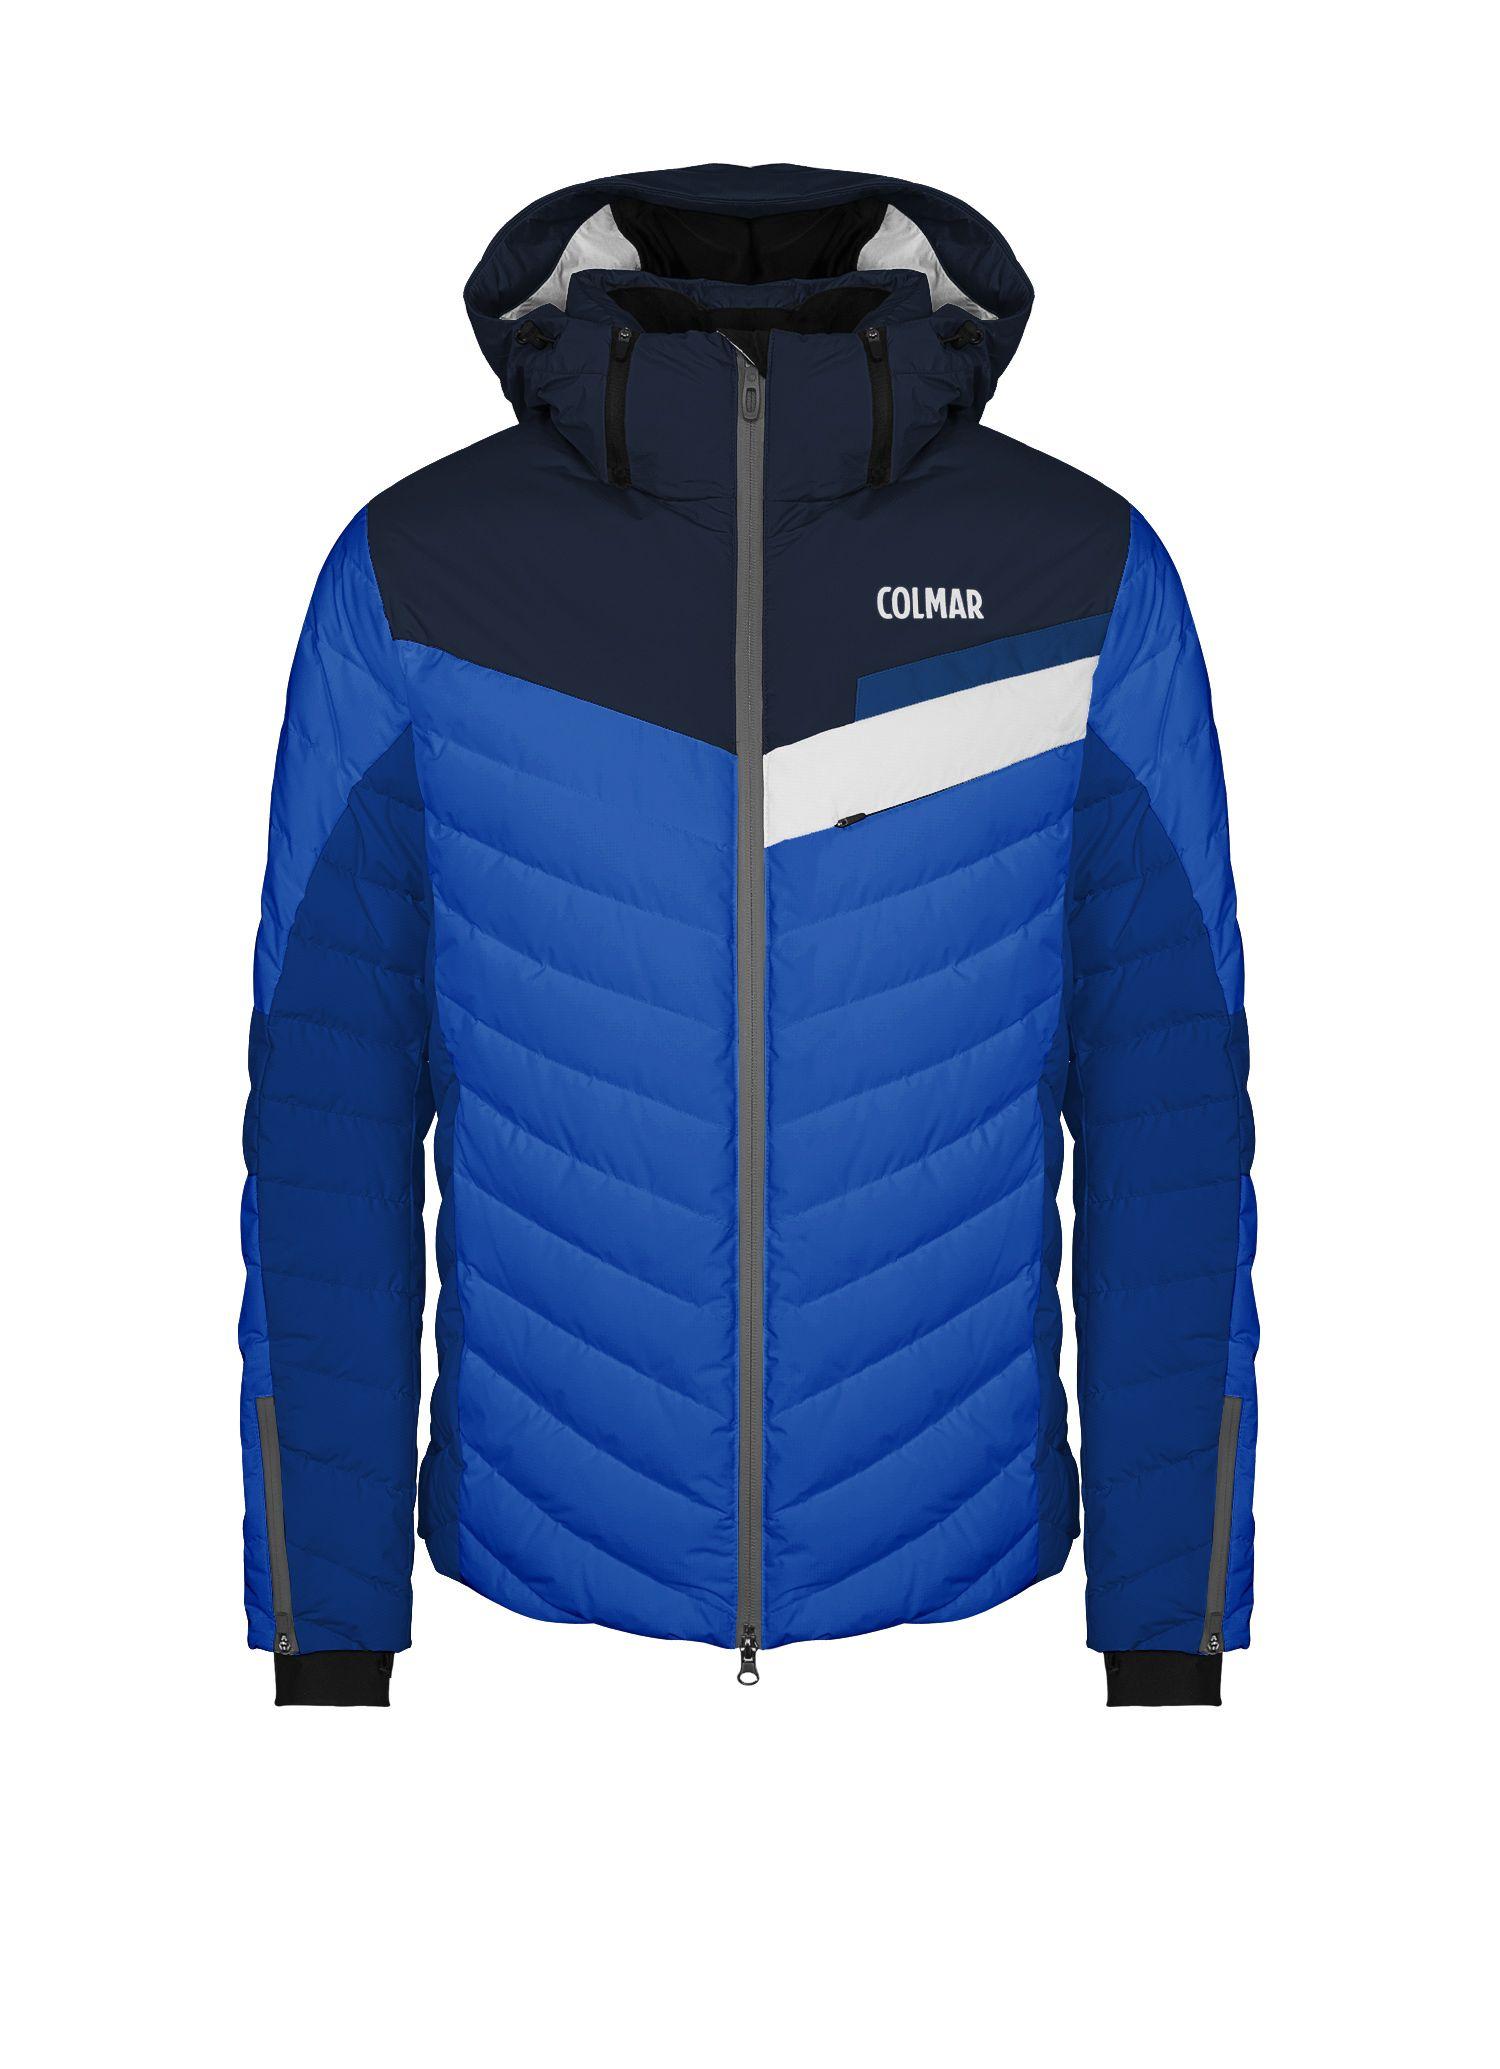 HOKKAIDO men s ski jacket - Colmar  6e583be6f